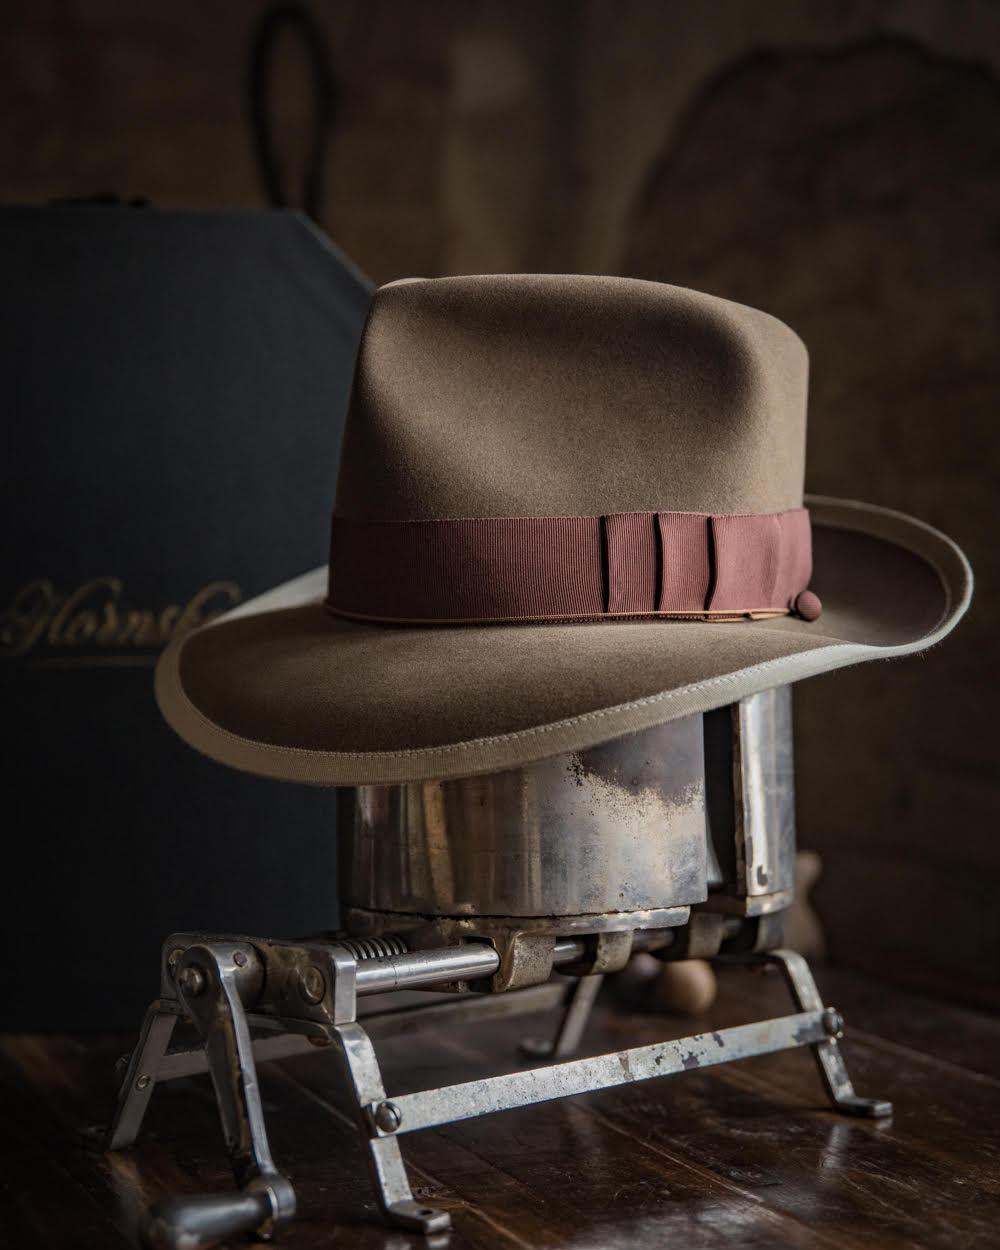 Hornskov hats model Bondurant